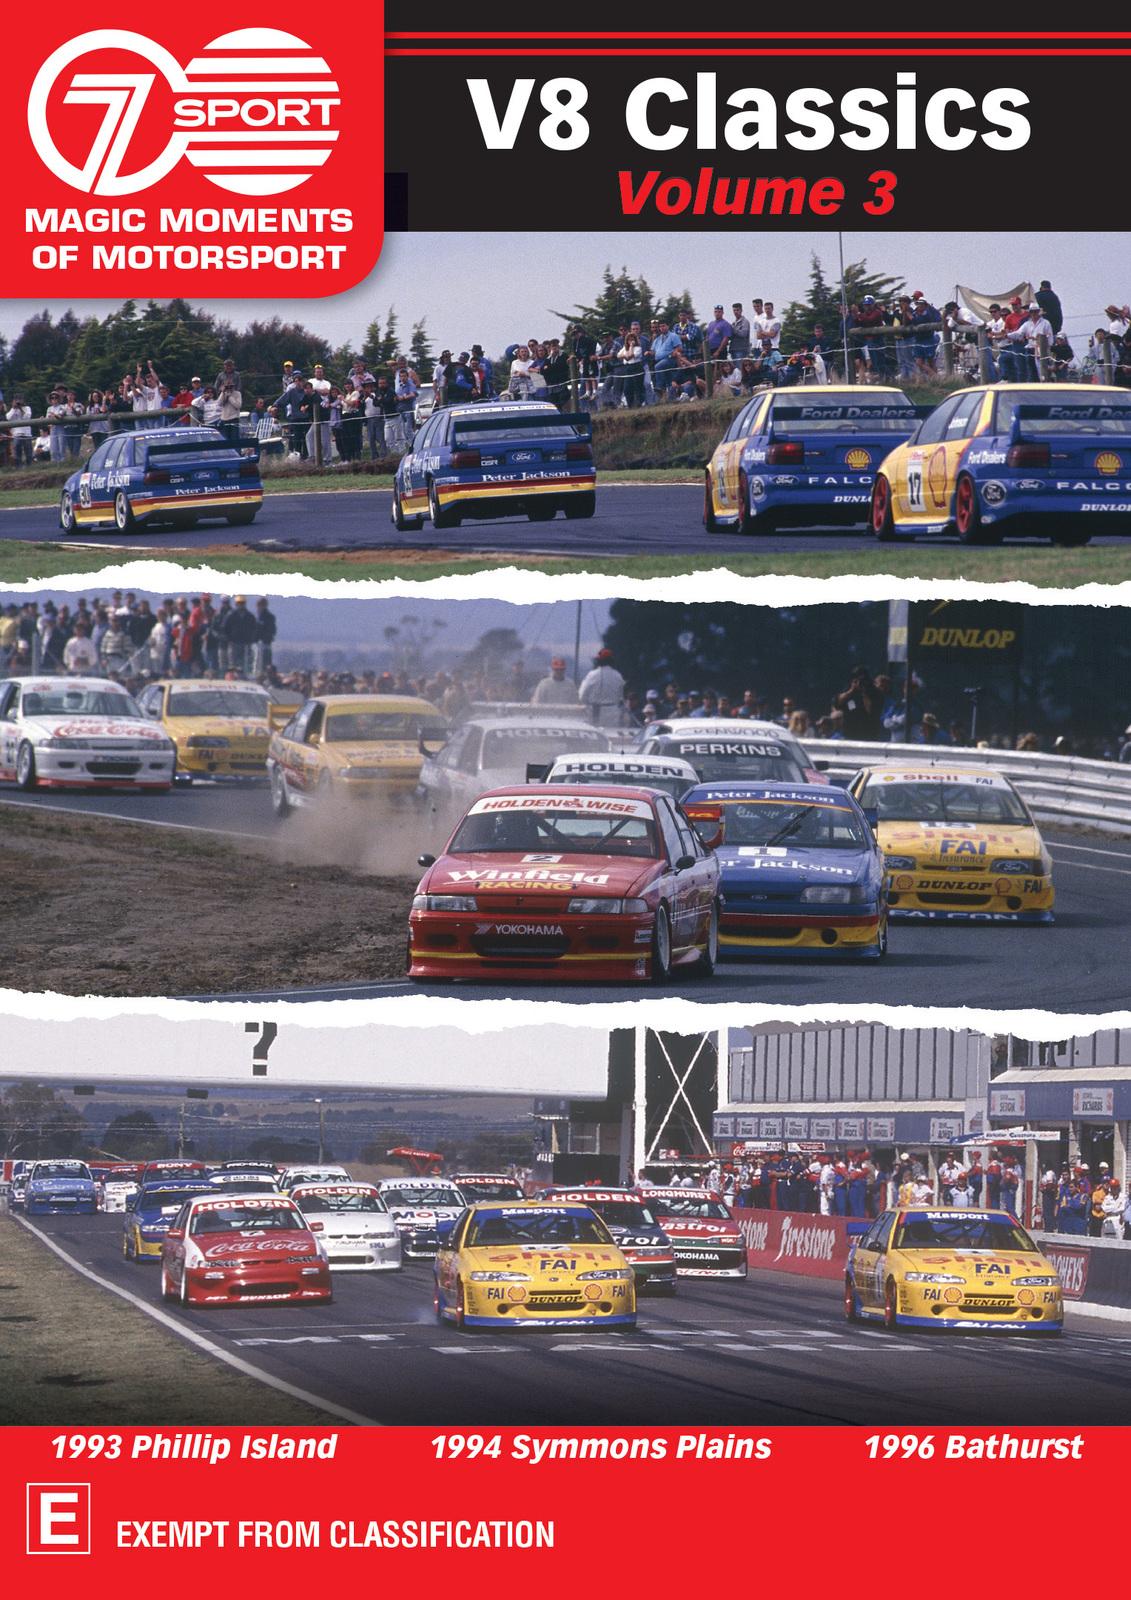 Magic Moments Of Motorsport: V8 Classics Volume 3 on DVD image